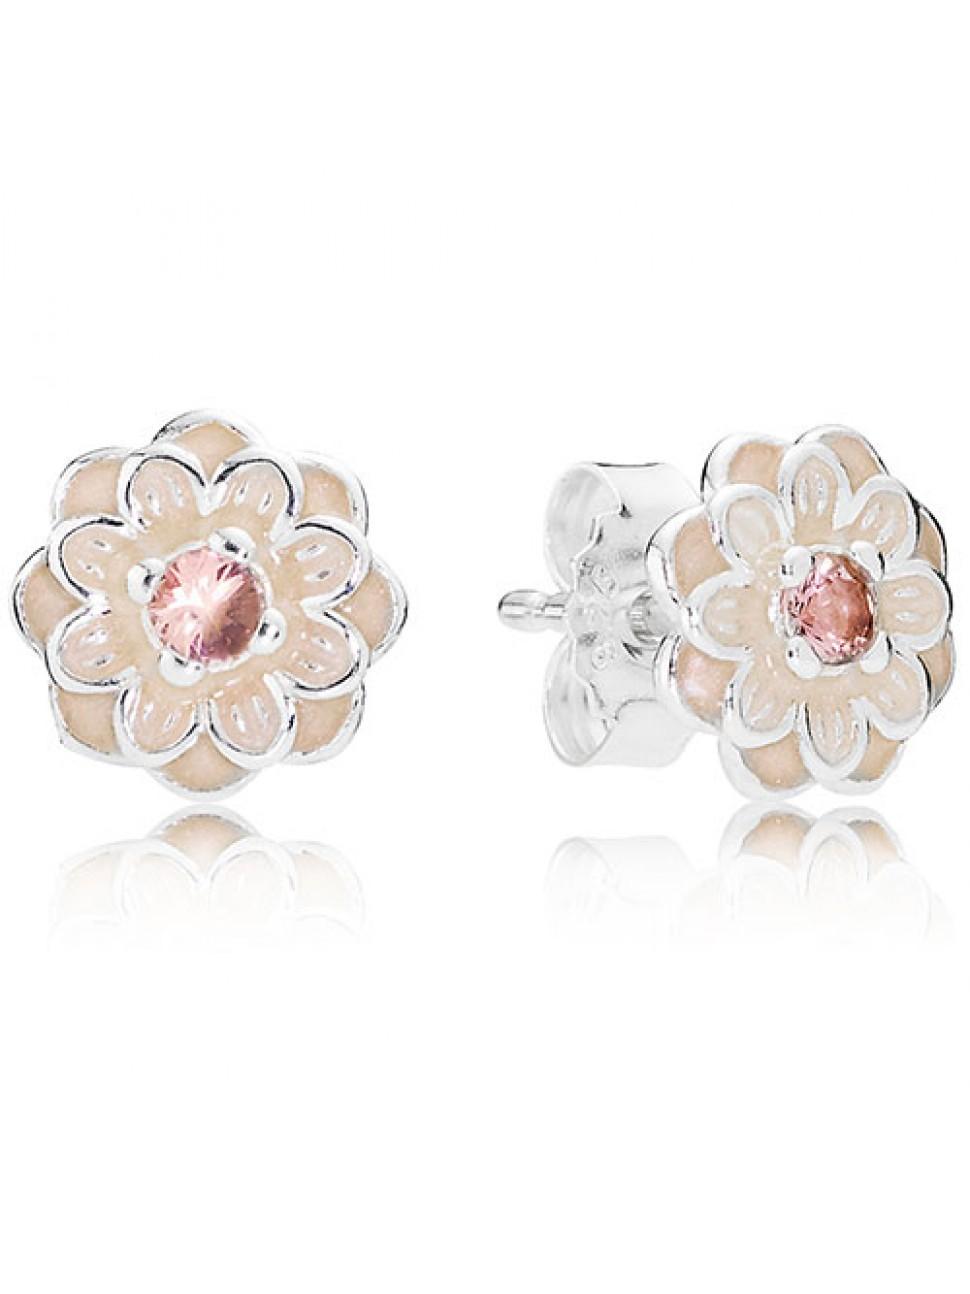 Blooming Dahlia Earrings Enjoy a Discount